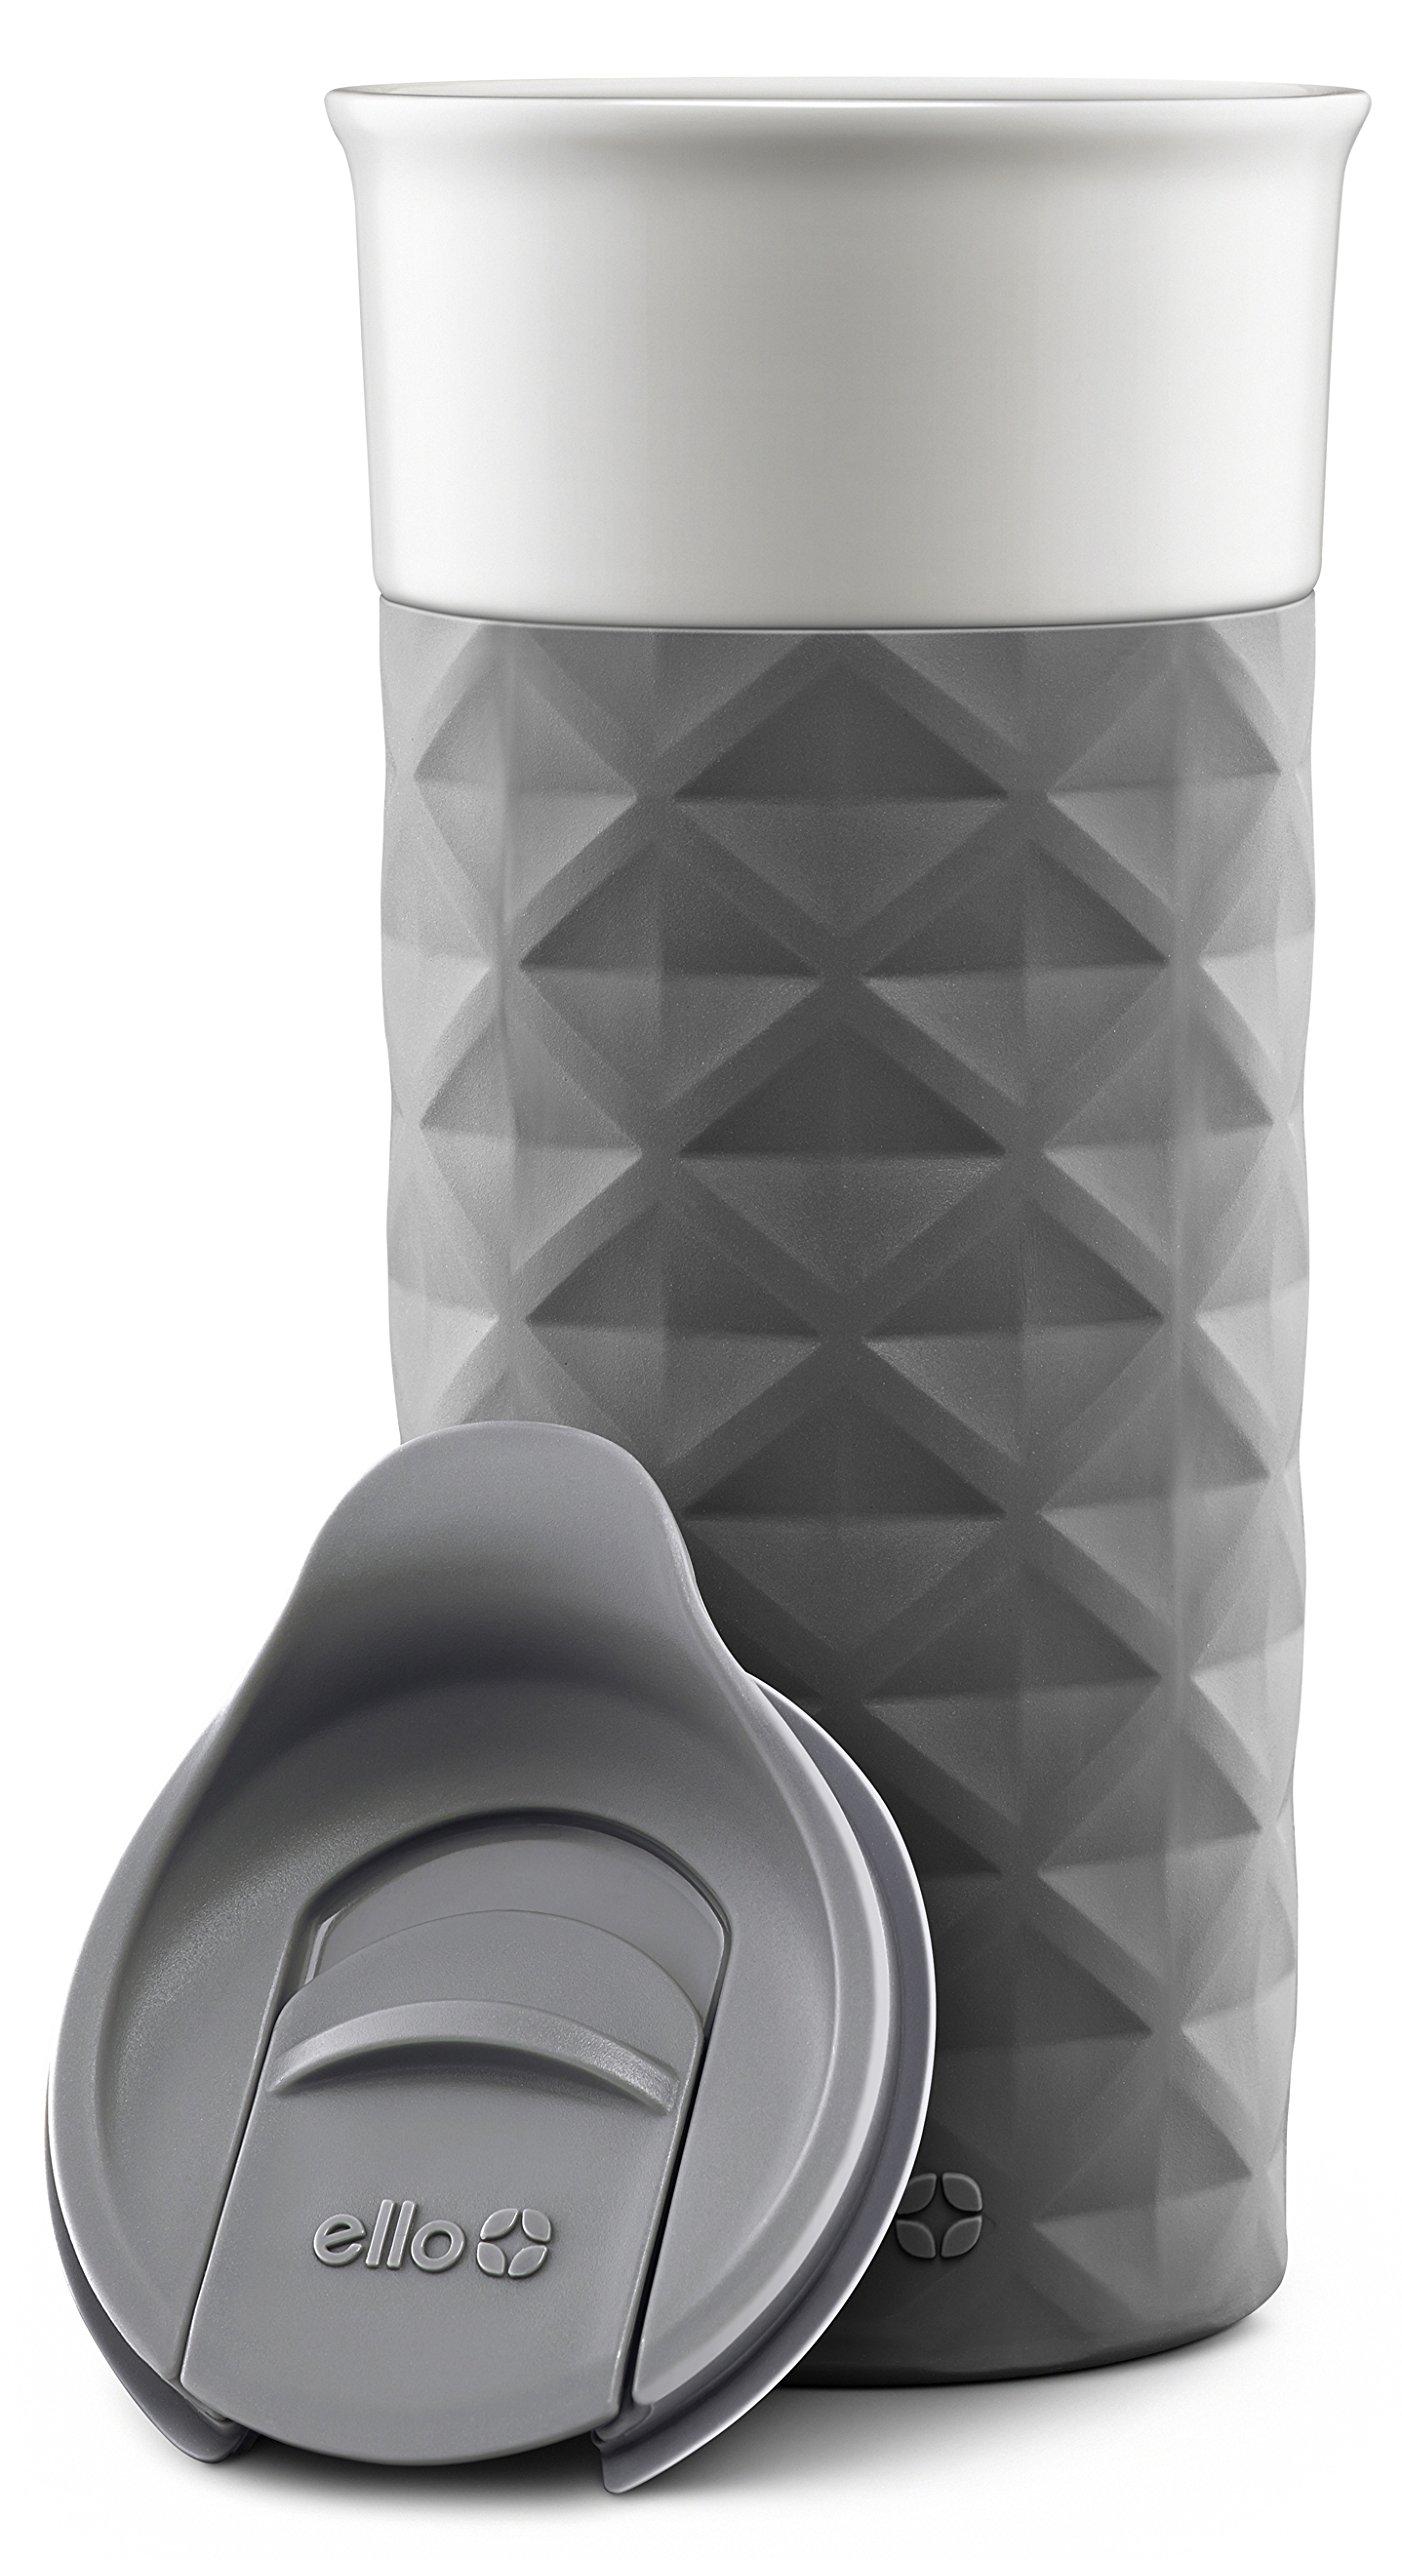 Ello Ogden BPA-Free Ceramic Travel Mug with Lid, Grey, 16 oz by Ello (Image #3)